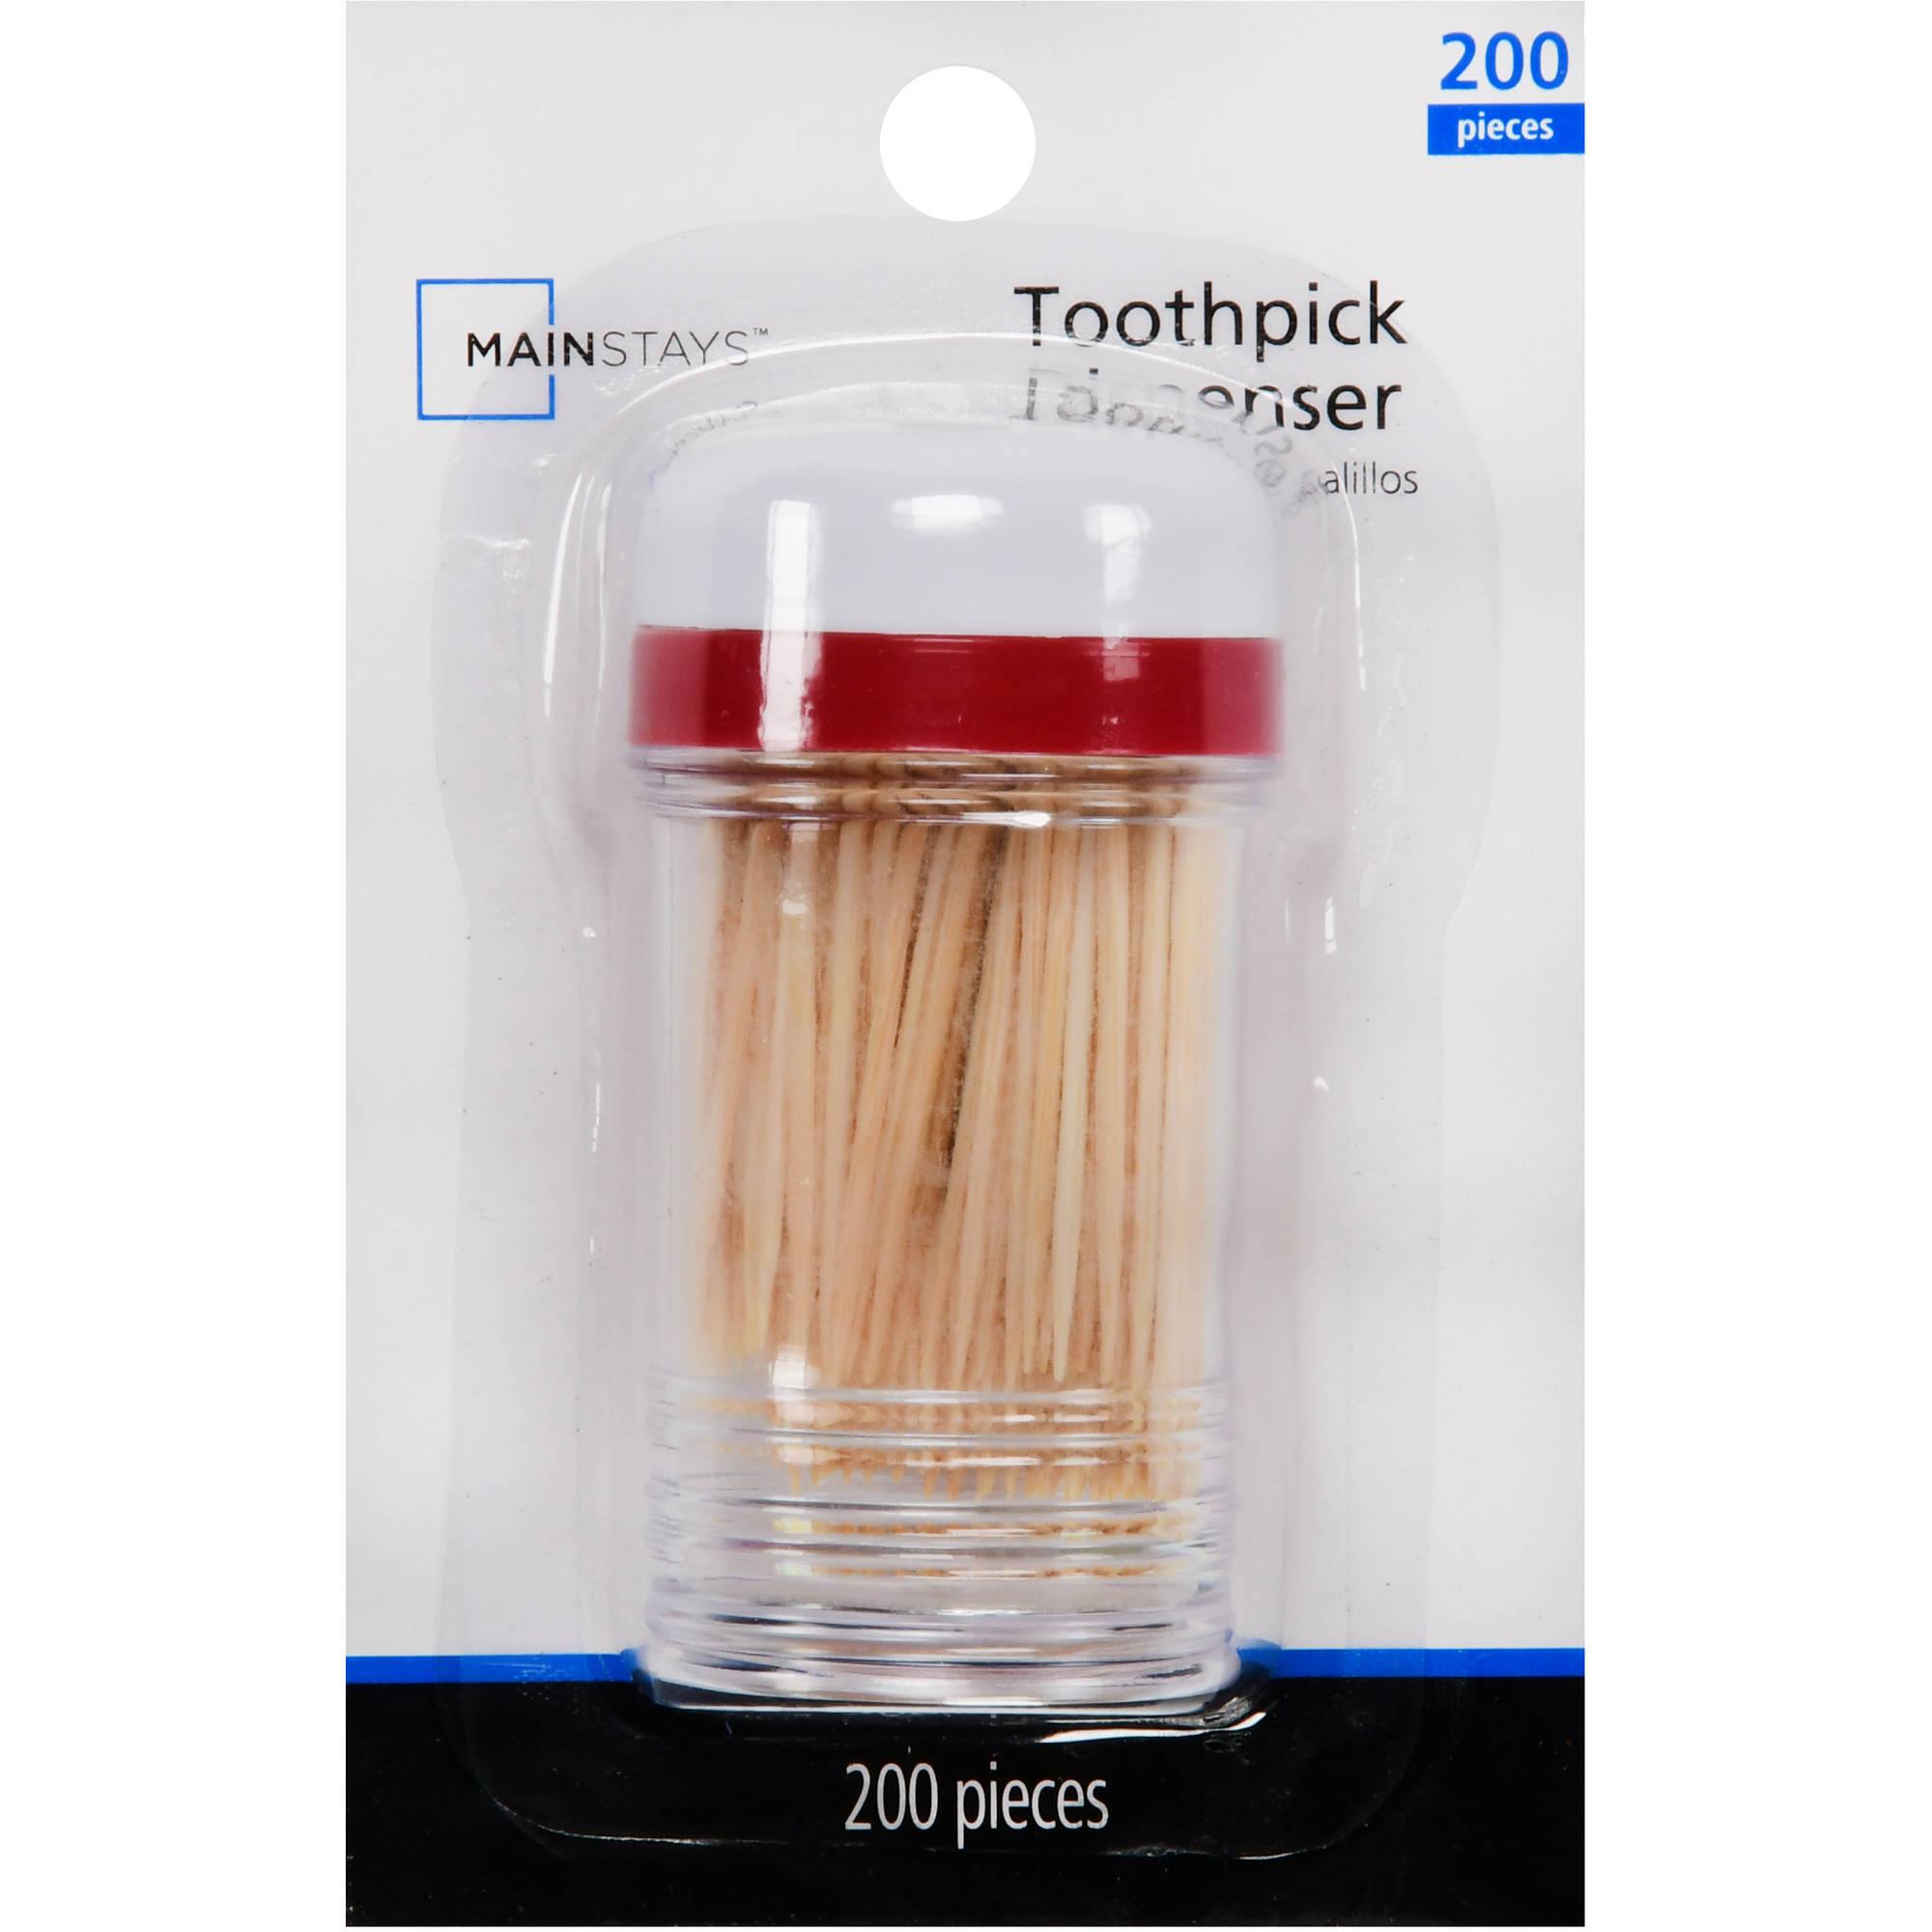 Mainstays Toothpick